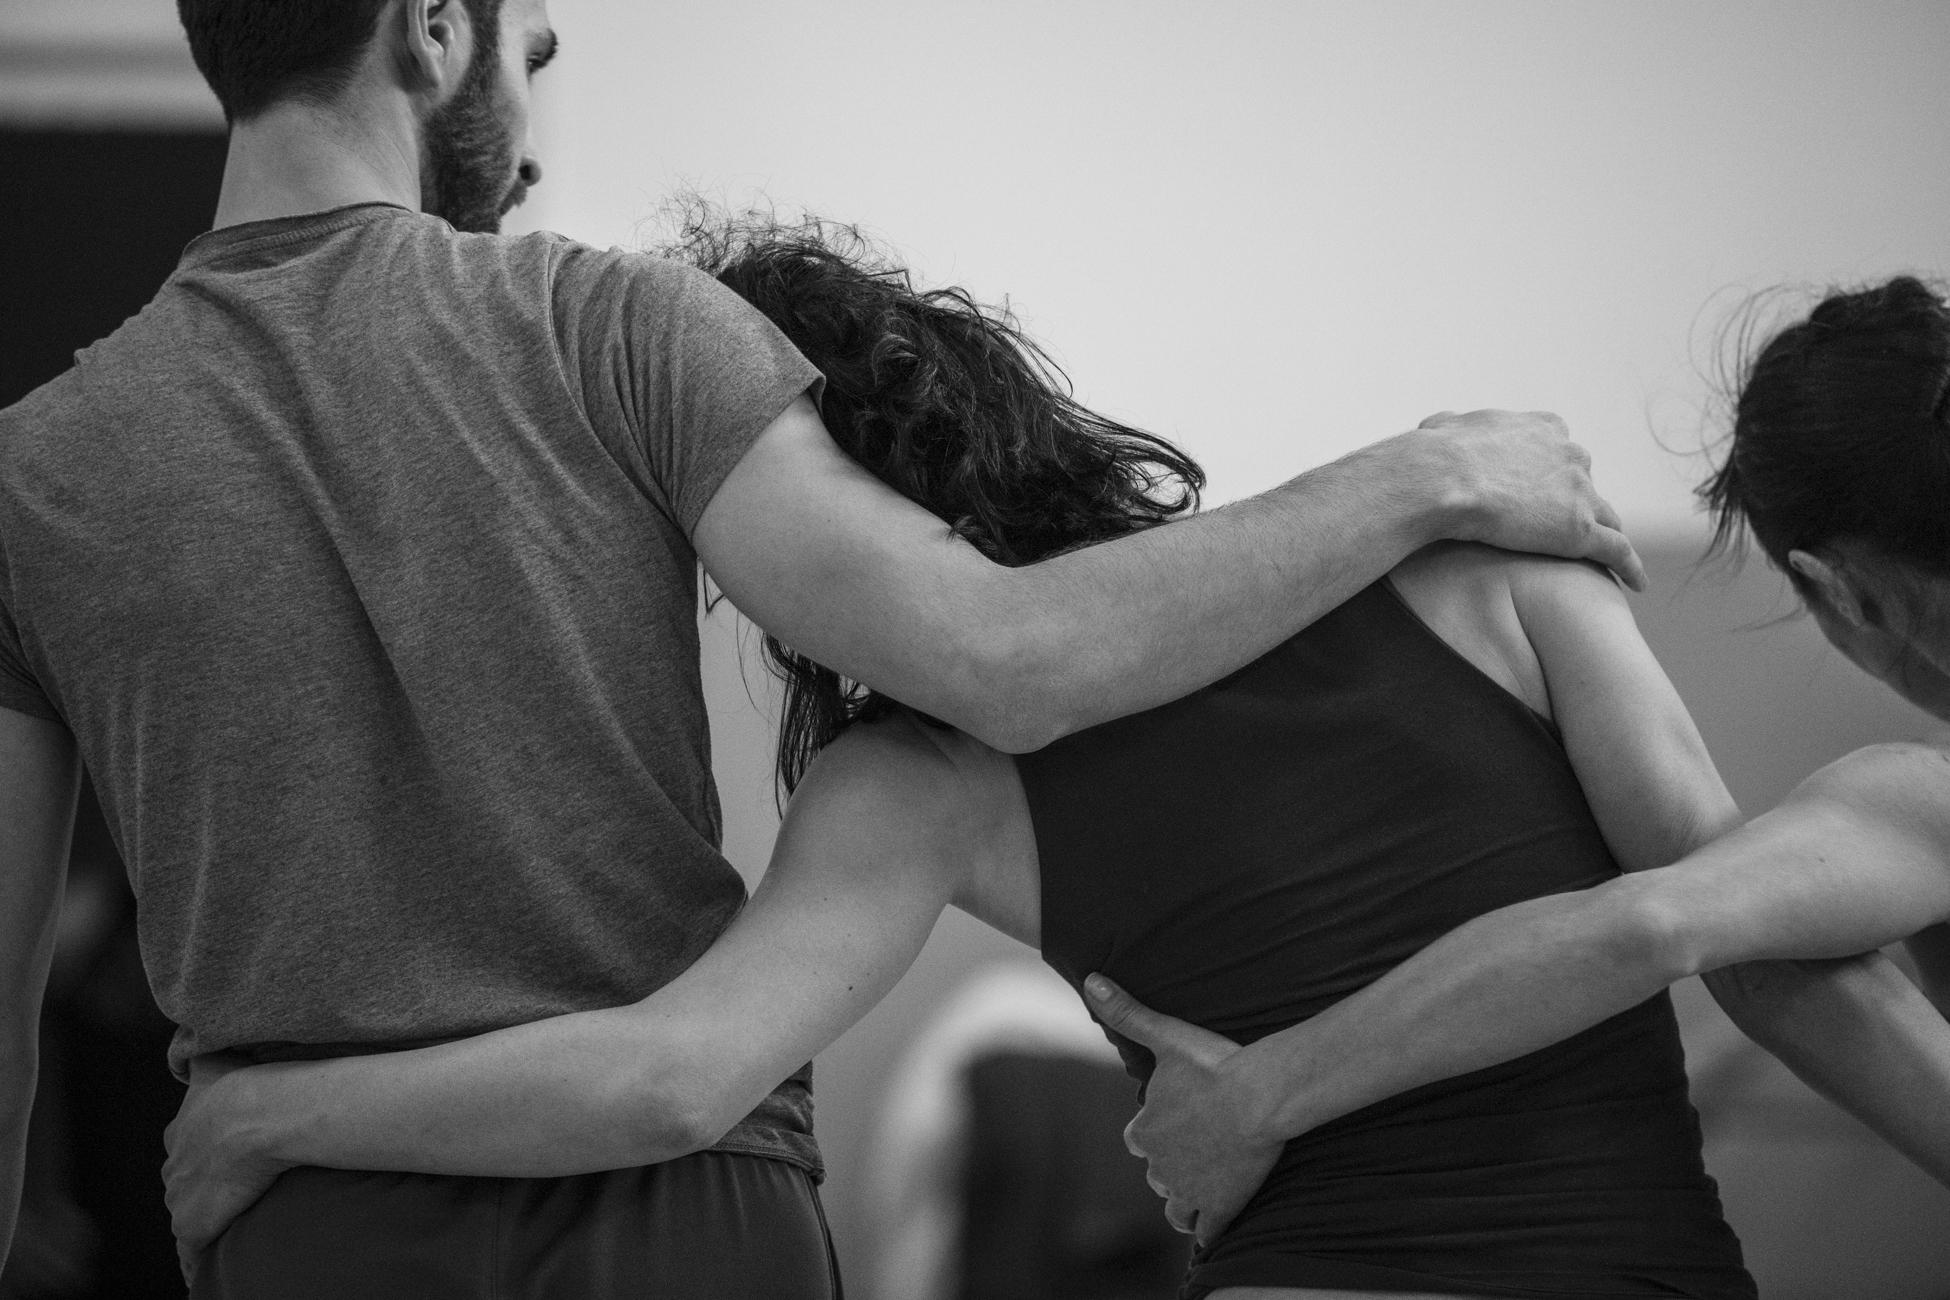 baletno druženje izrada utakmica za južne indijske kundli